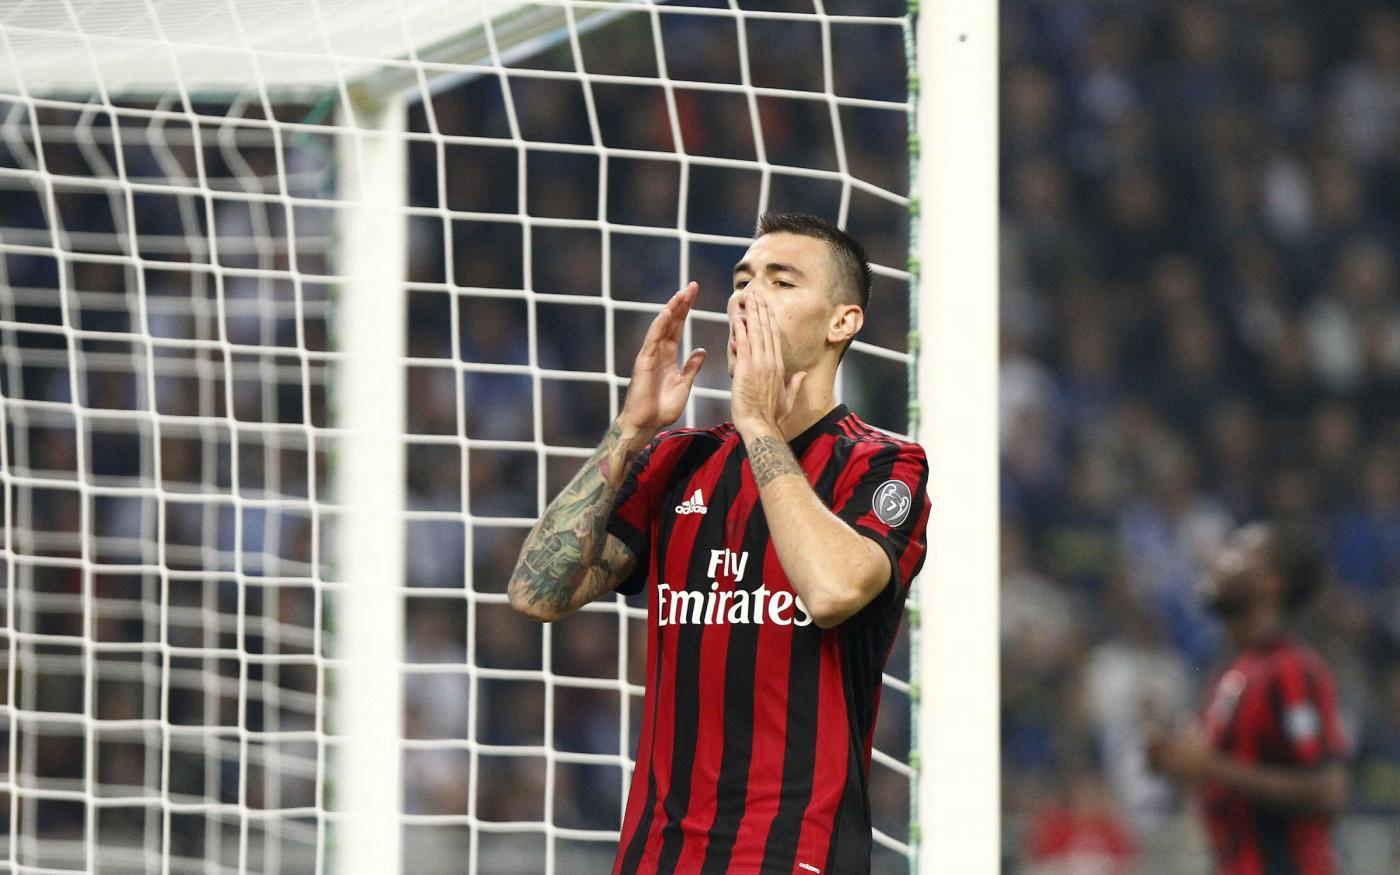 Chievo-Milan, Romagnoli a caldo: